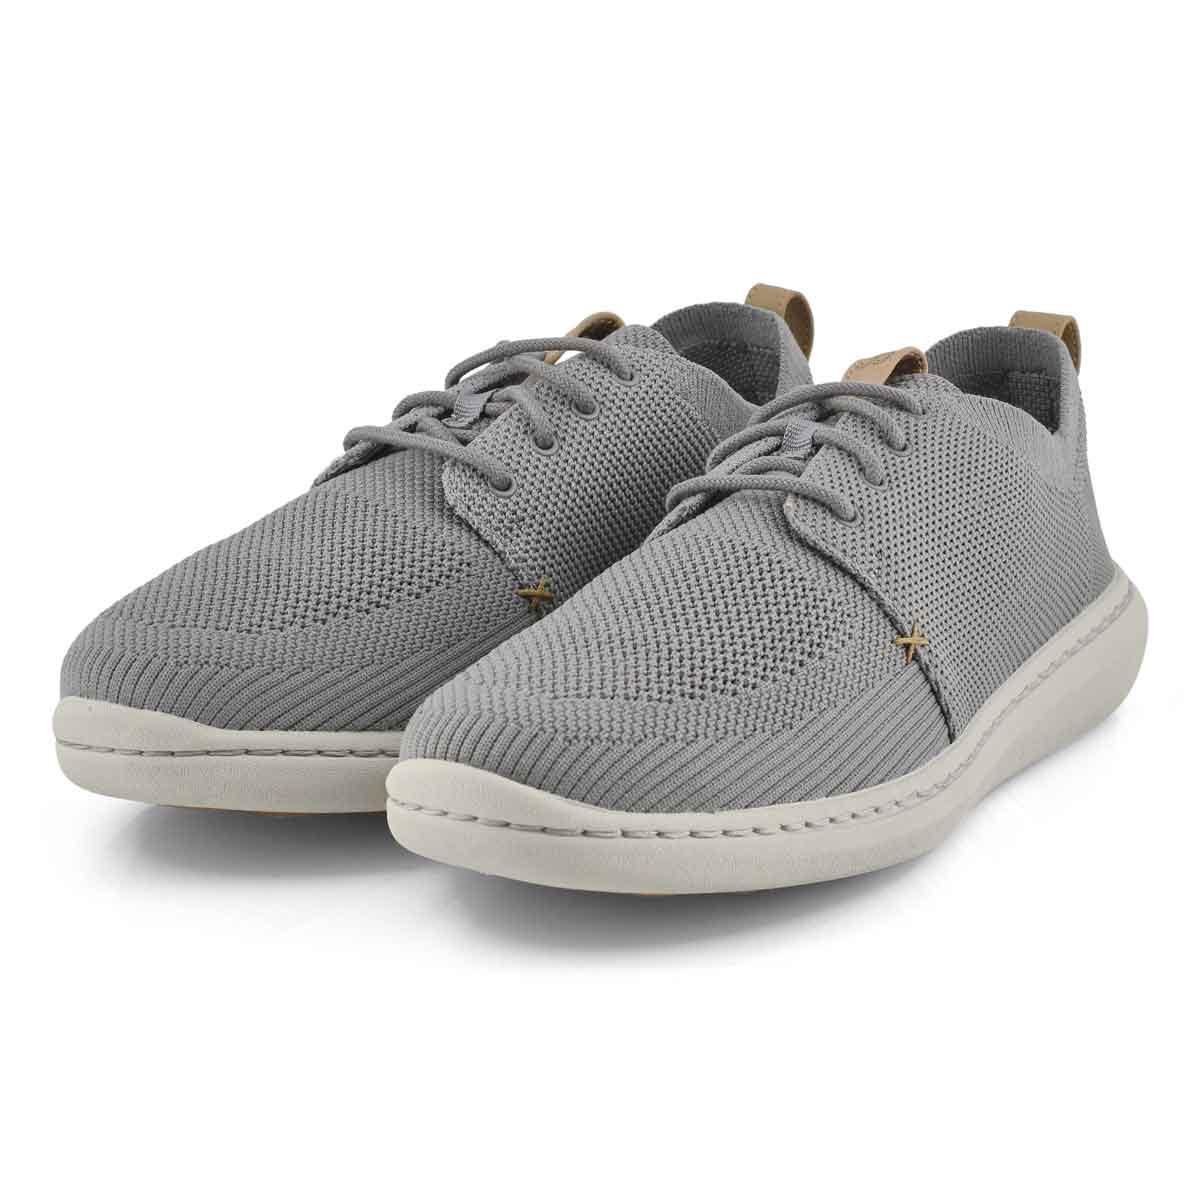 Chaussure Step Urban Mix, gris, hommes